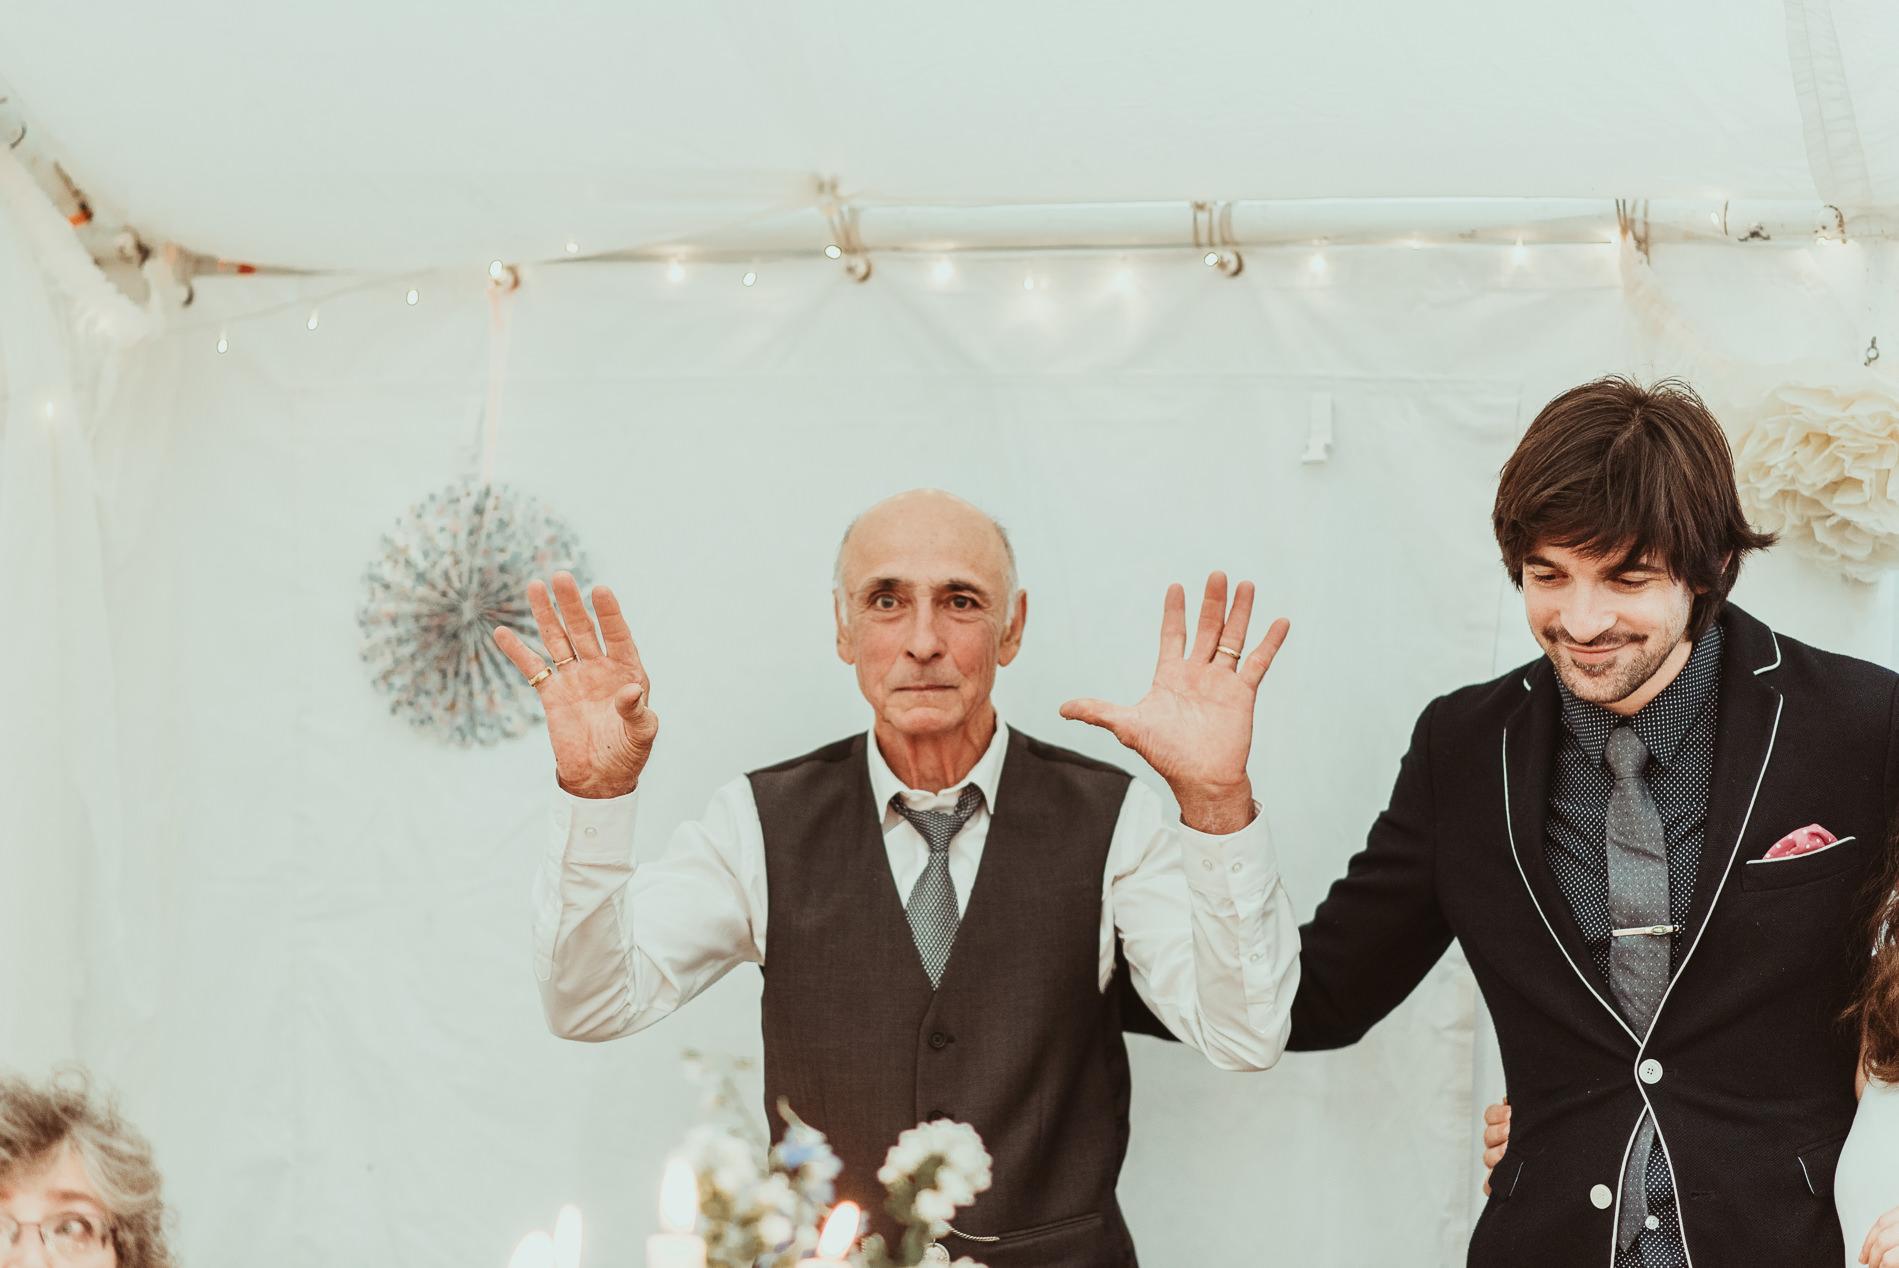 bohemian_wedding_lawshall_church_garden76